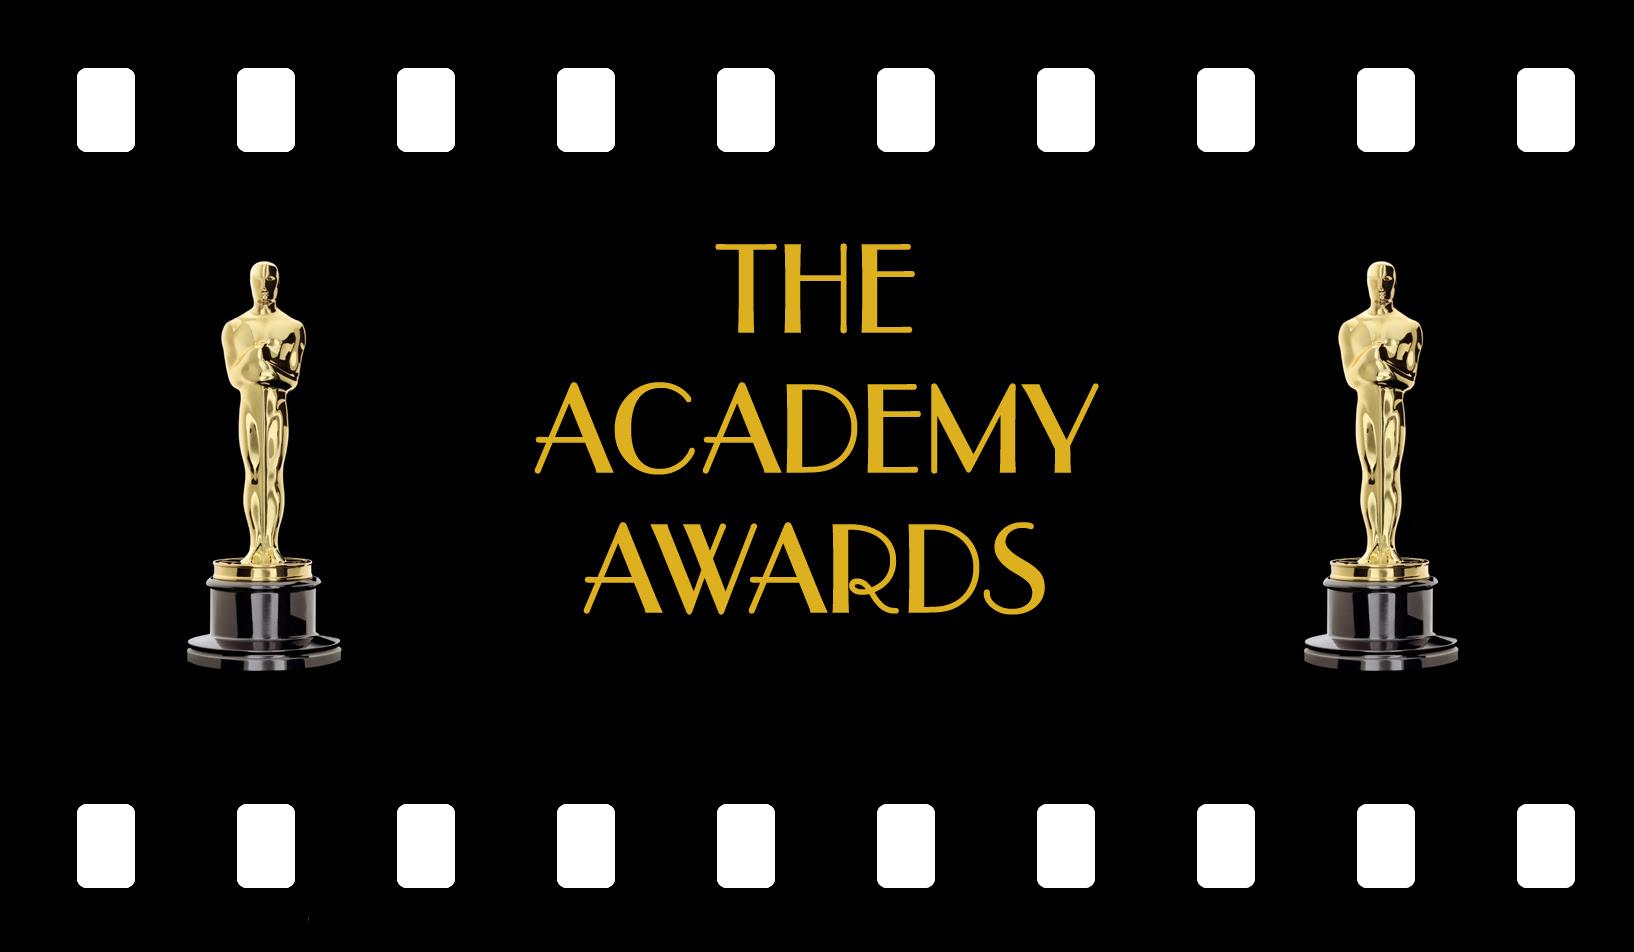 Oscar Awards 2015 - Who Should Win | Film News ...